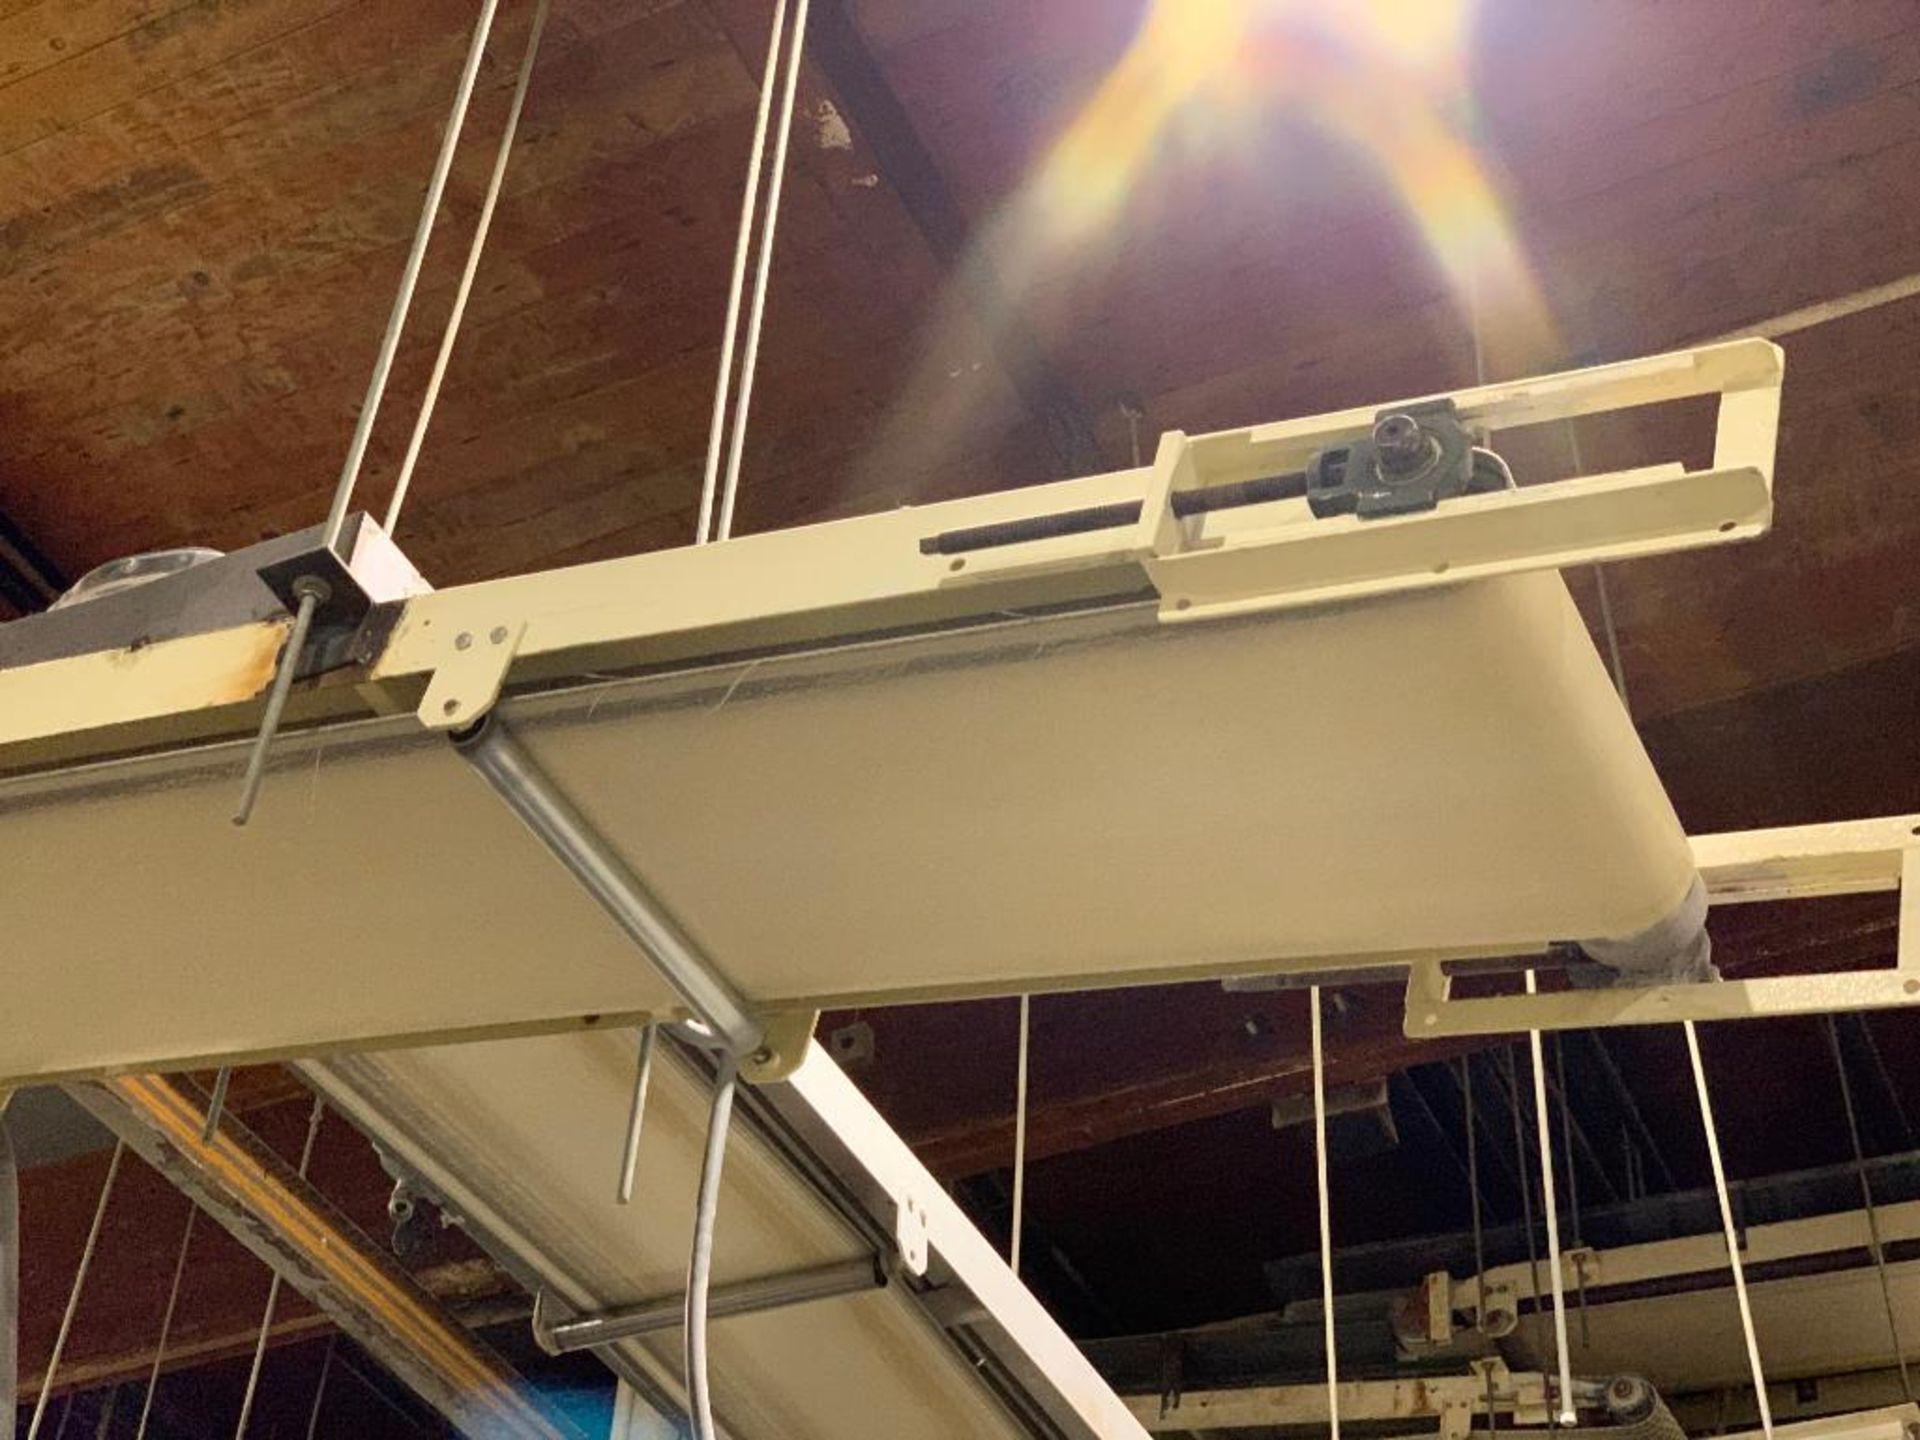 Aseeco mild steel decline conveyor - Image 2 of 12